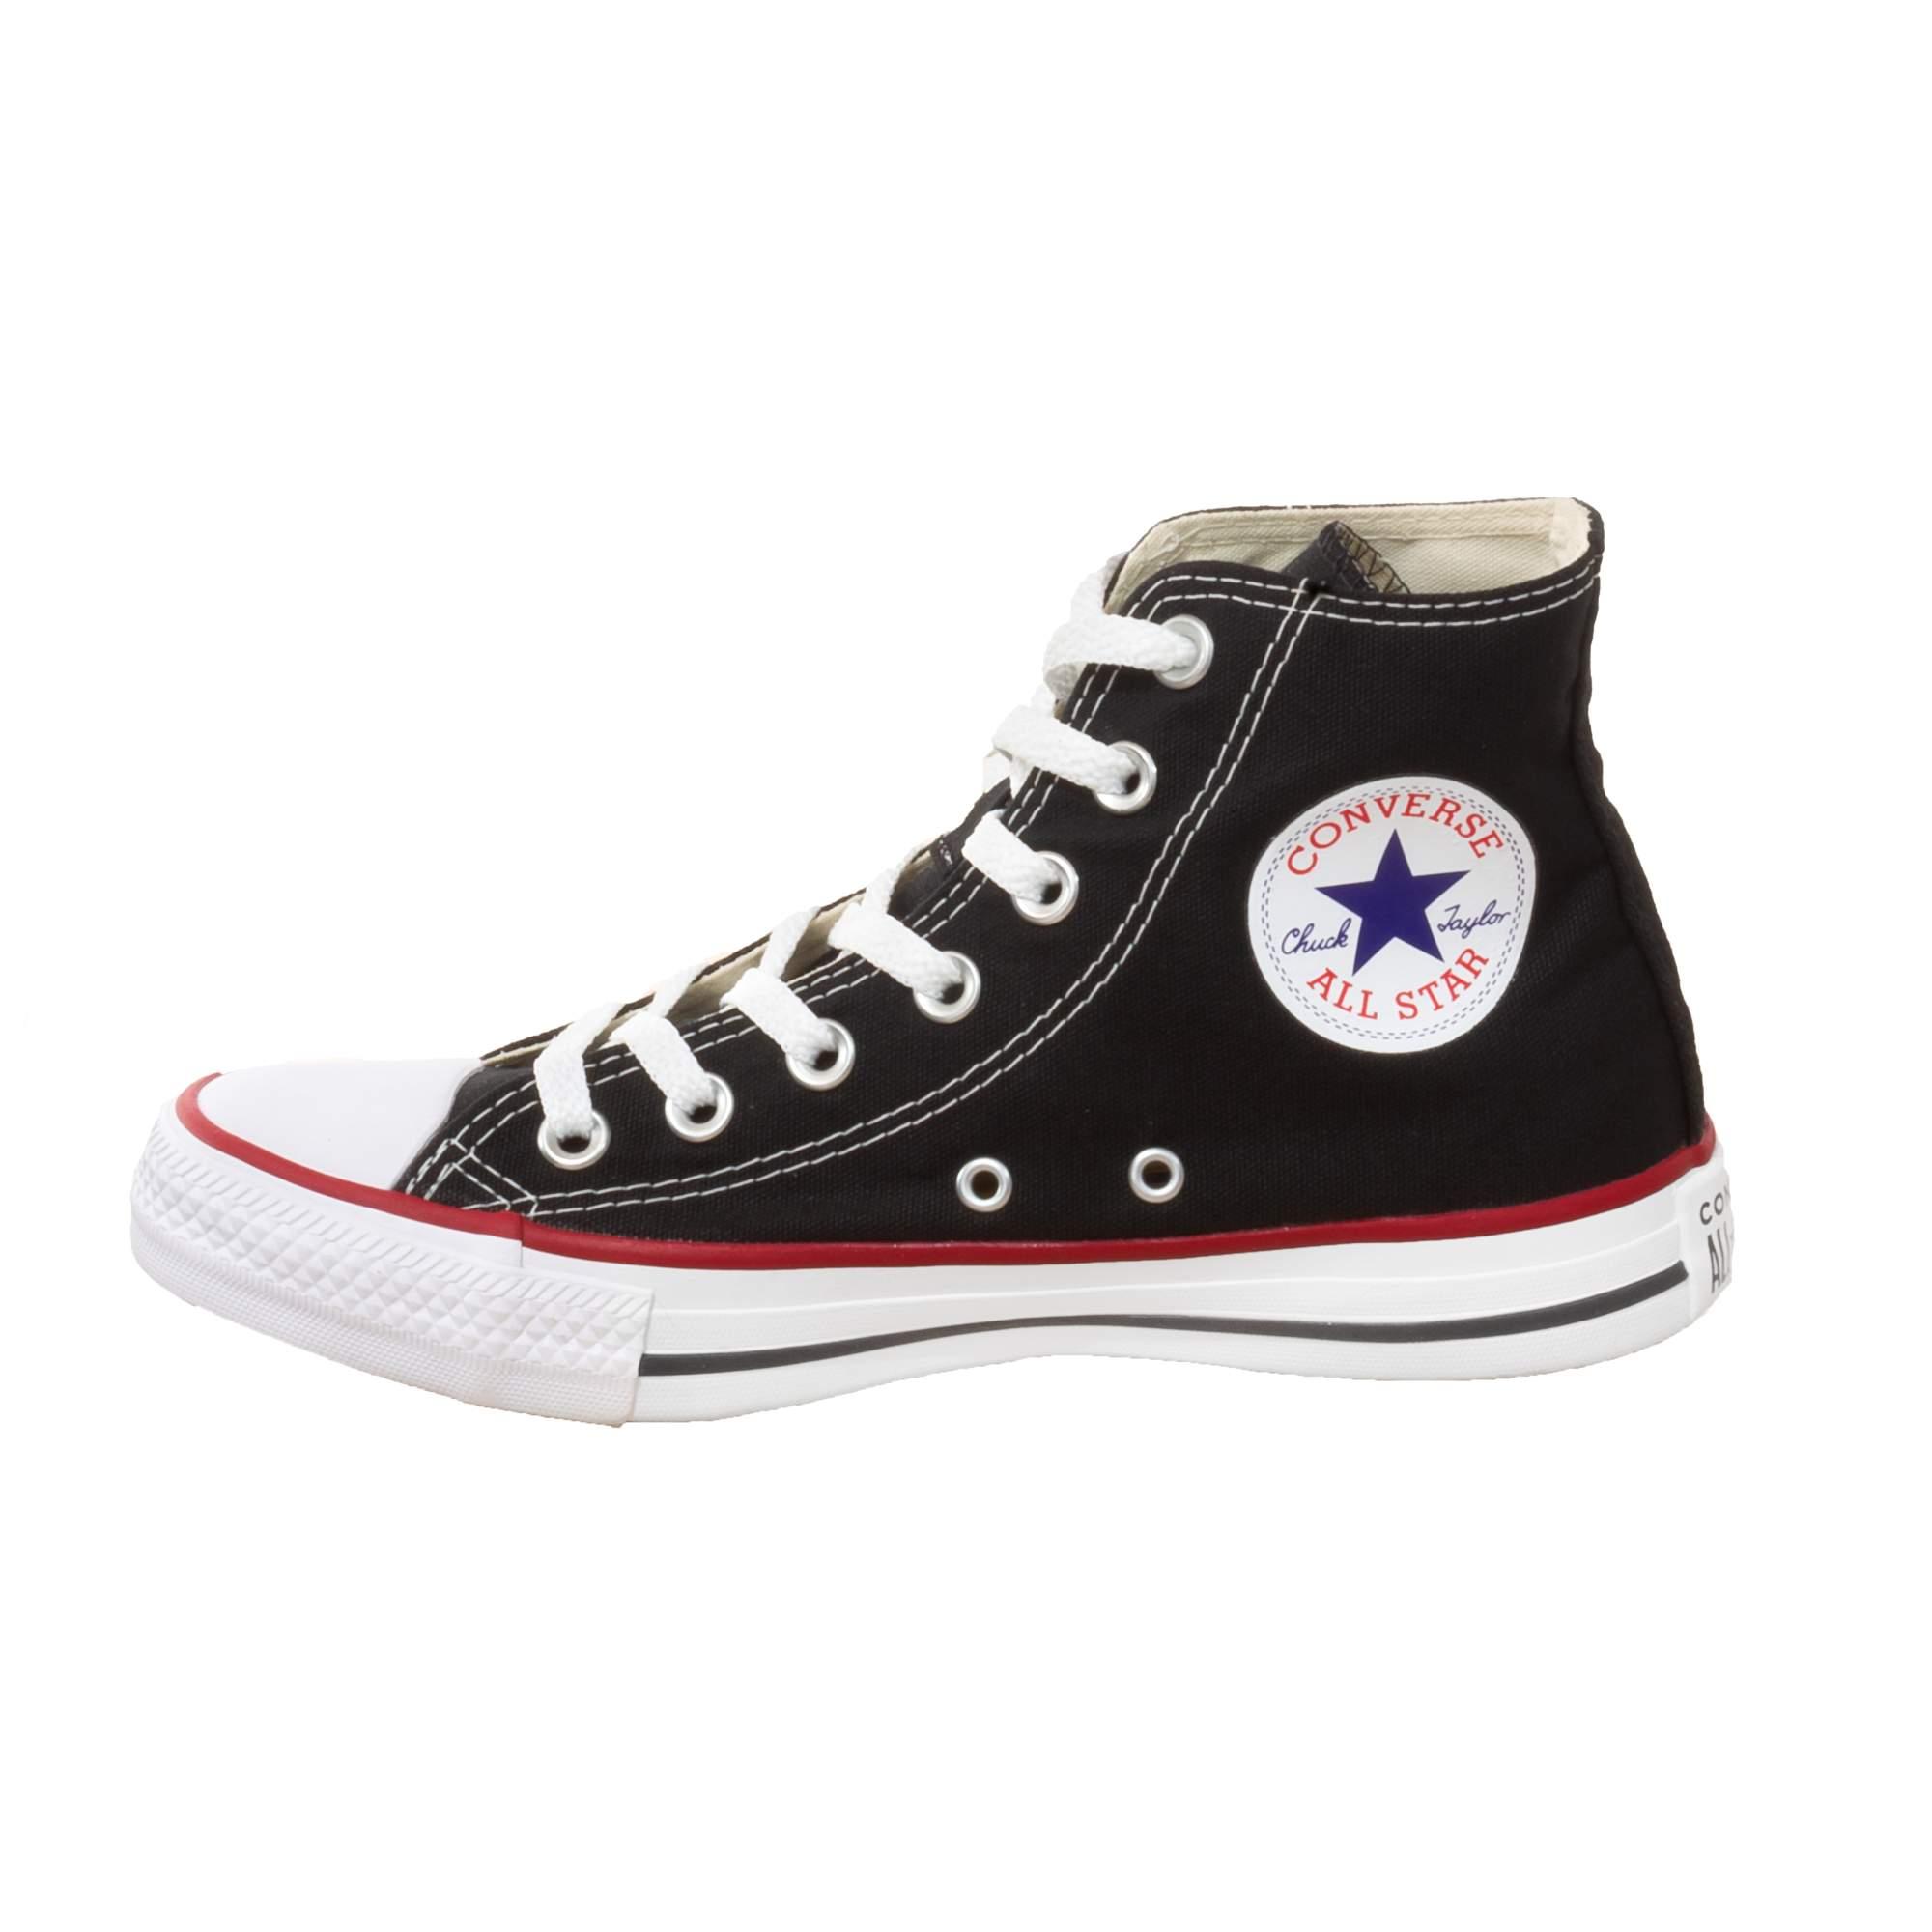 Tênis Converse All Star Chuck Taylor Preto Cano Longo